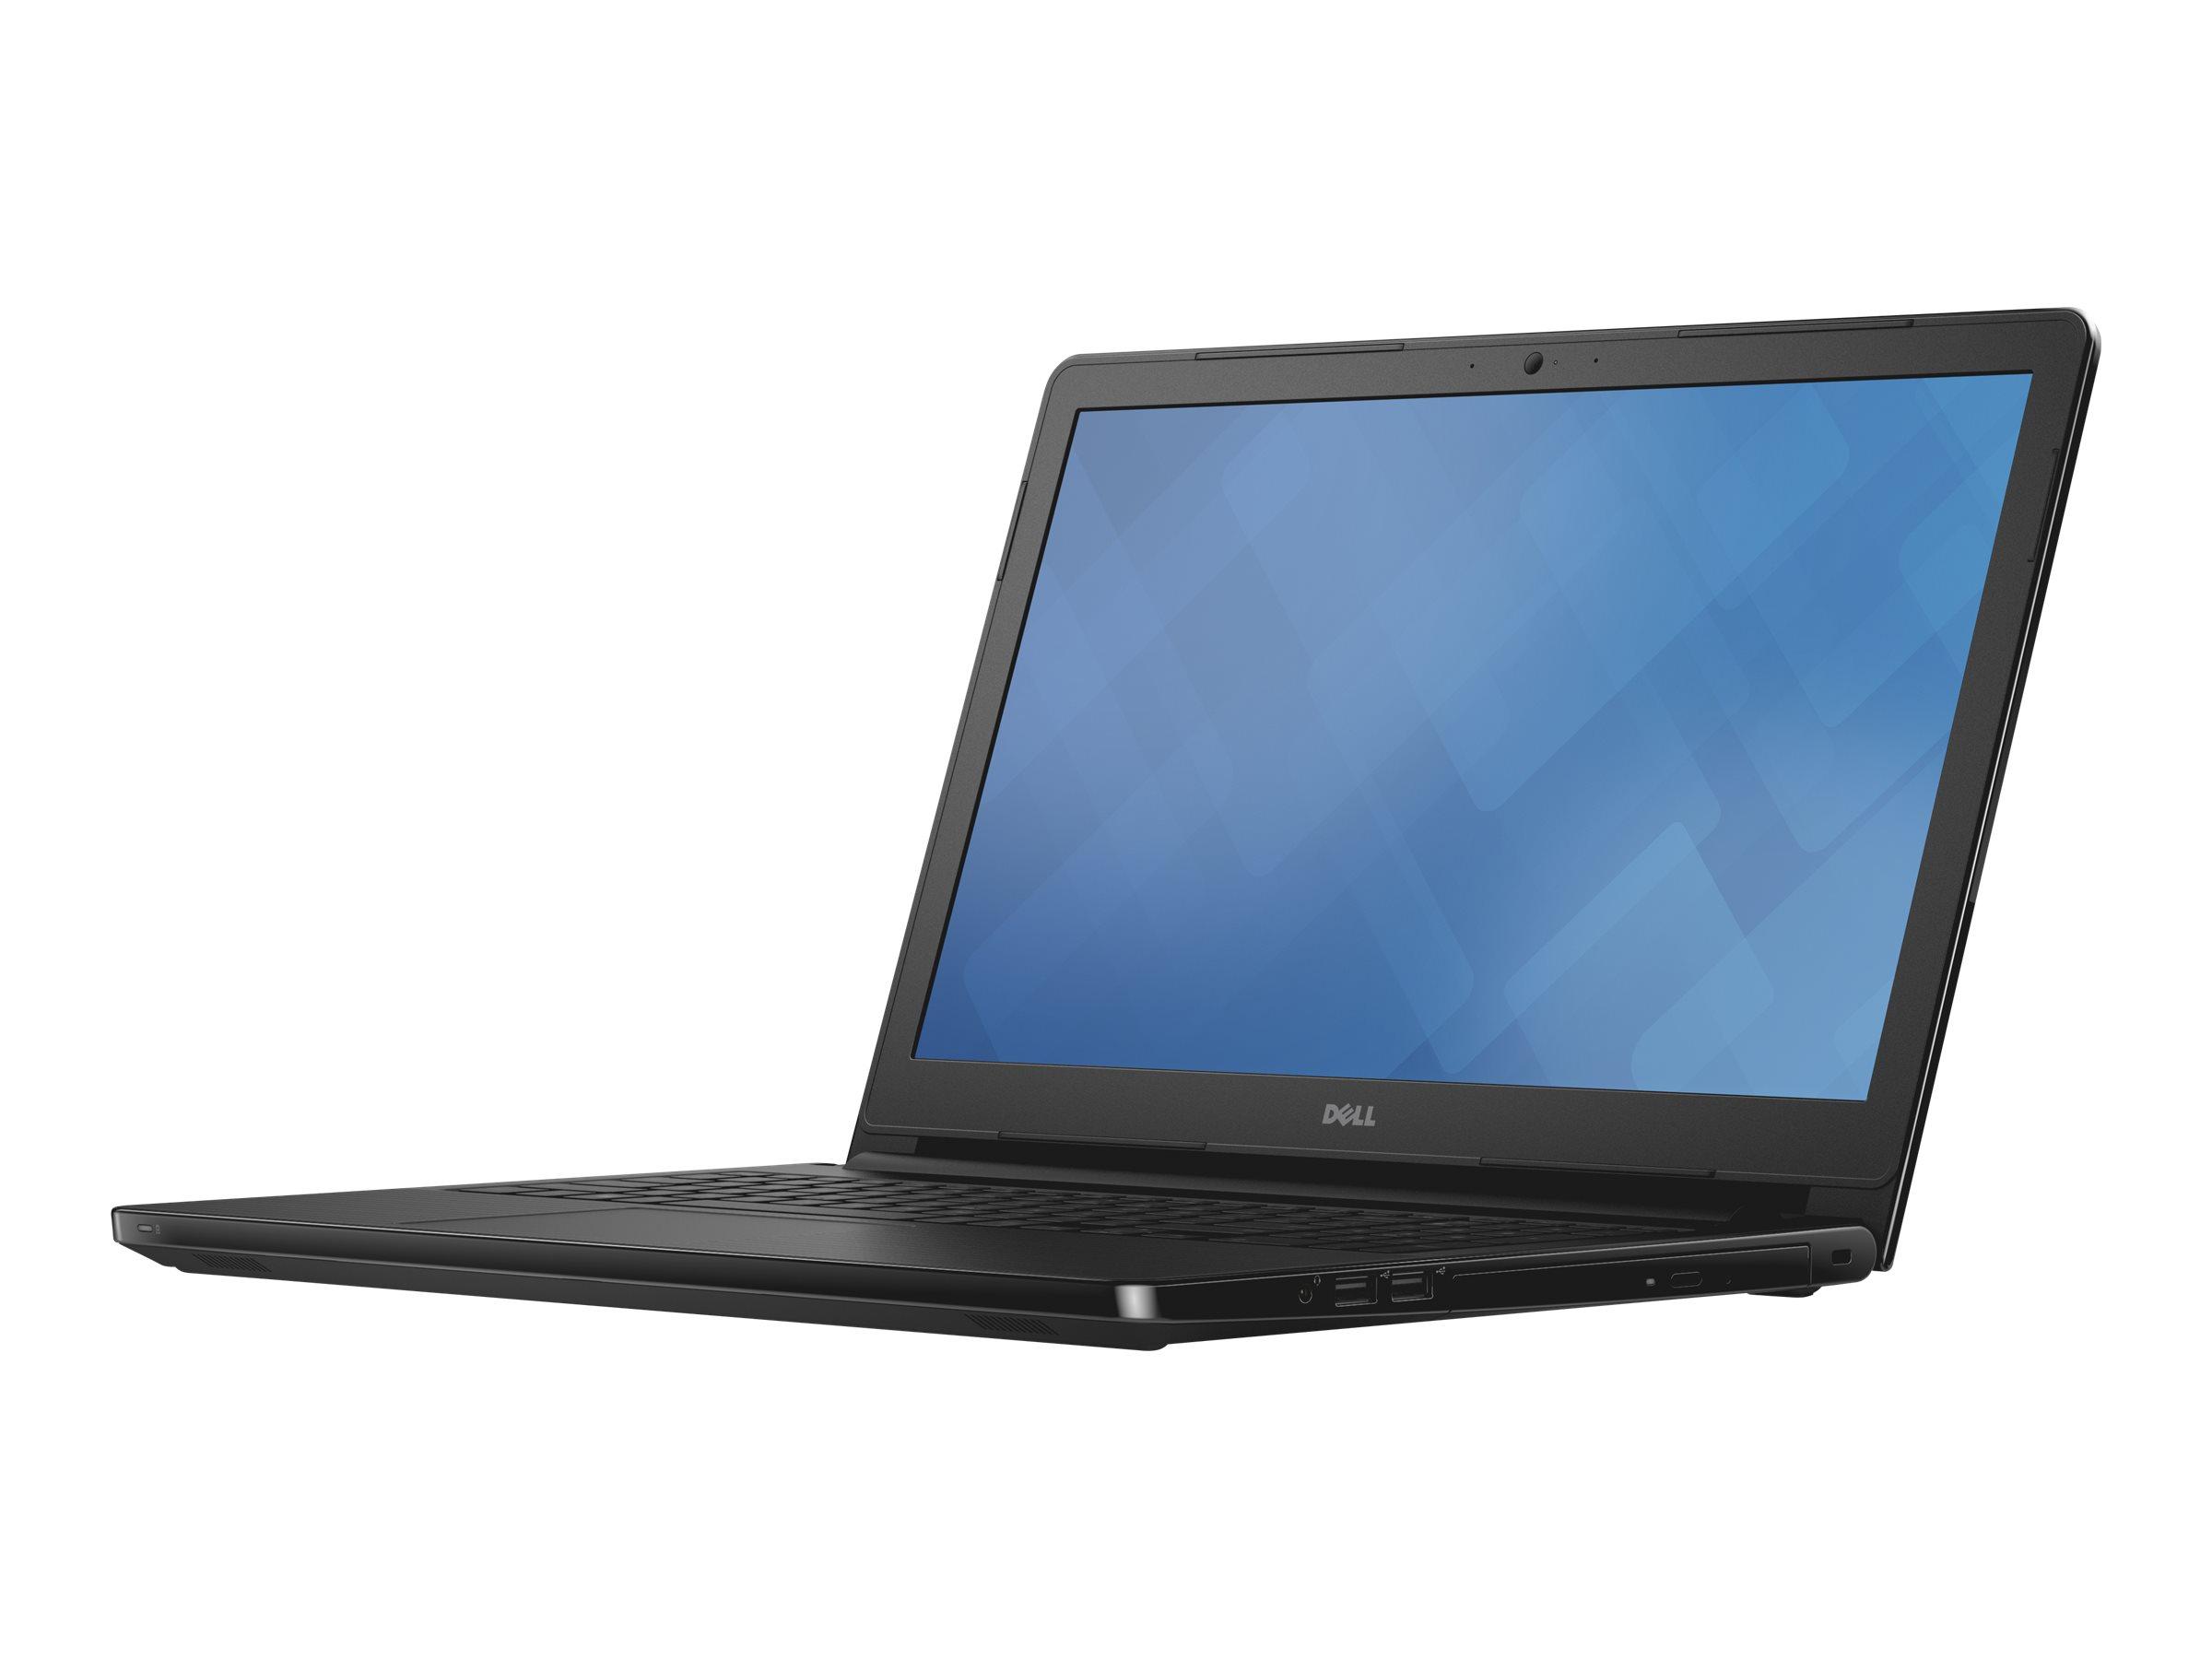 dell vostro 3558 ordinateur portable celeron 3215u 1 7 ghz 4 go ram 500 go hdd 15 6